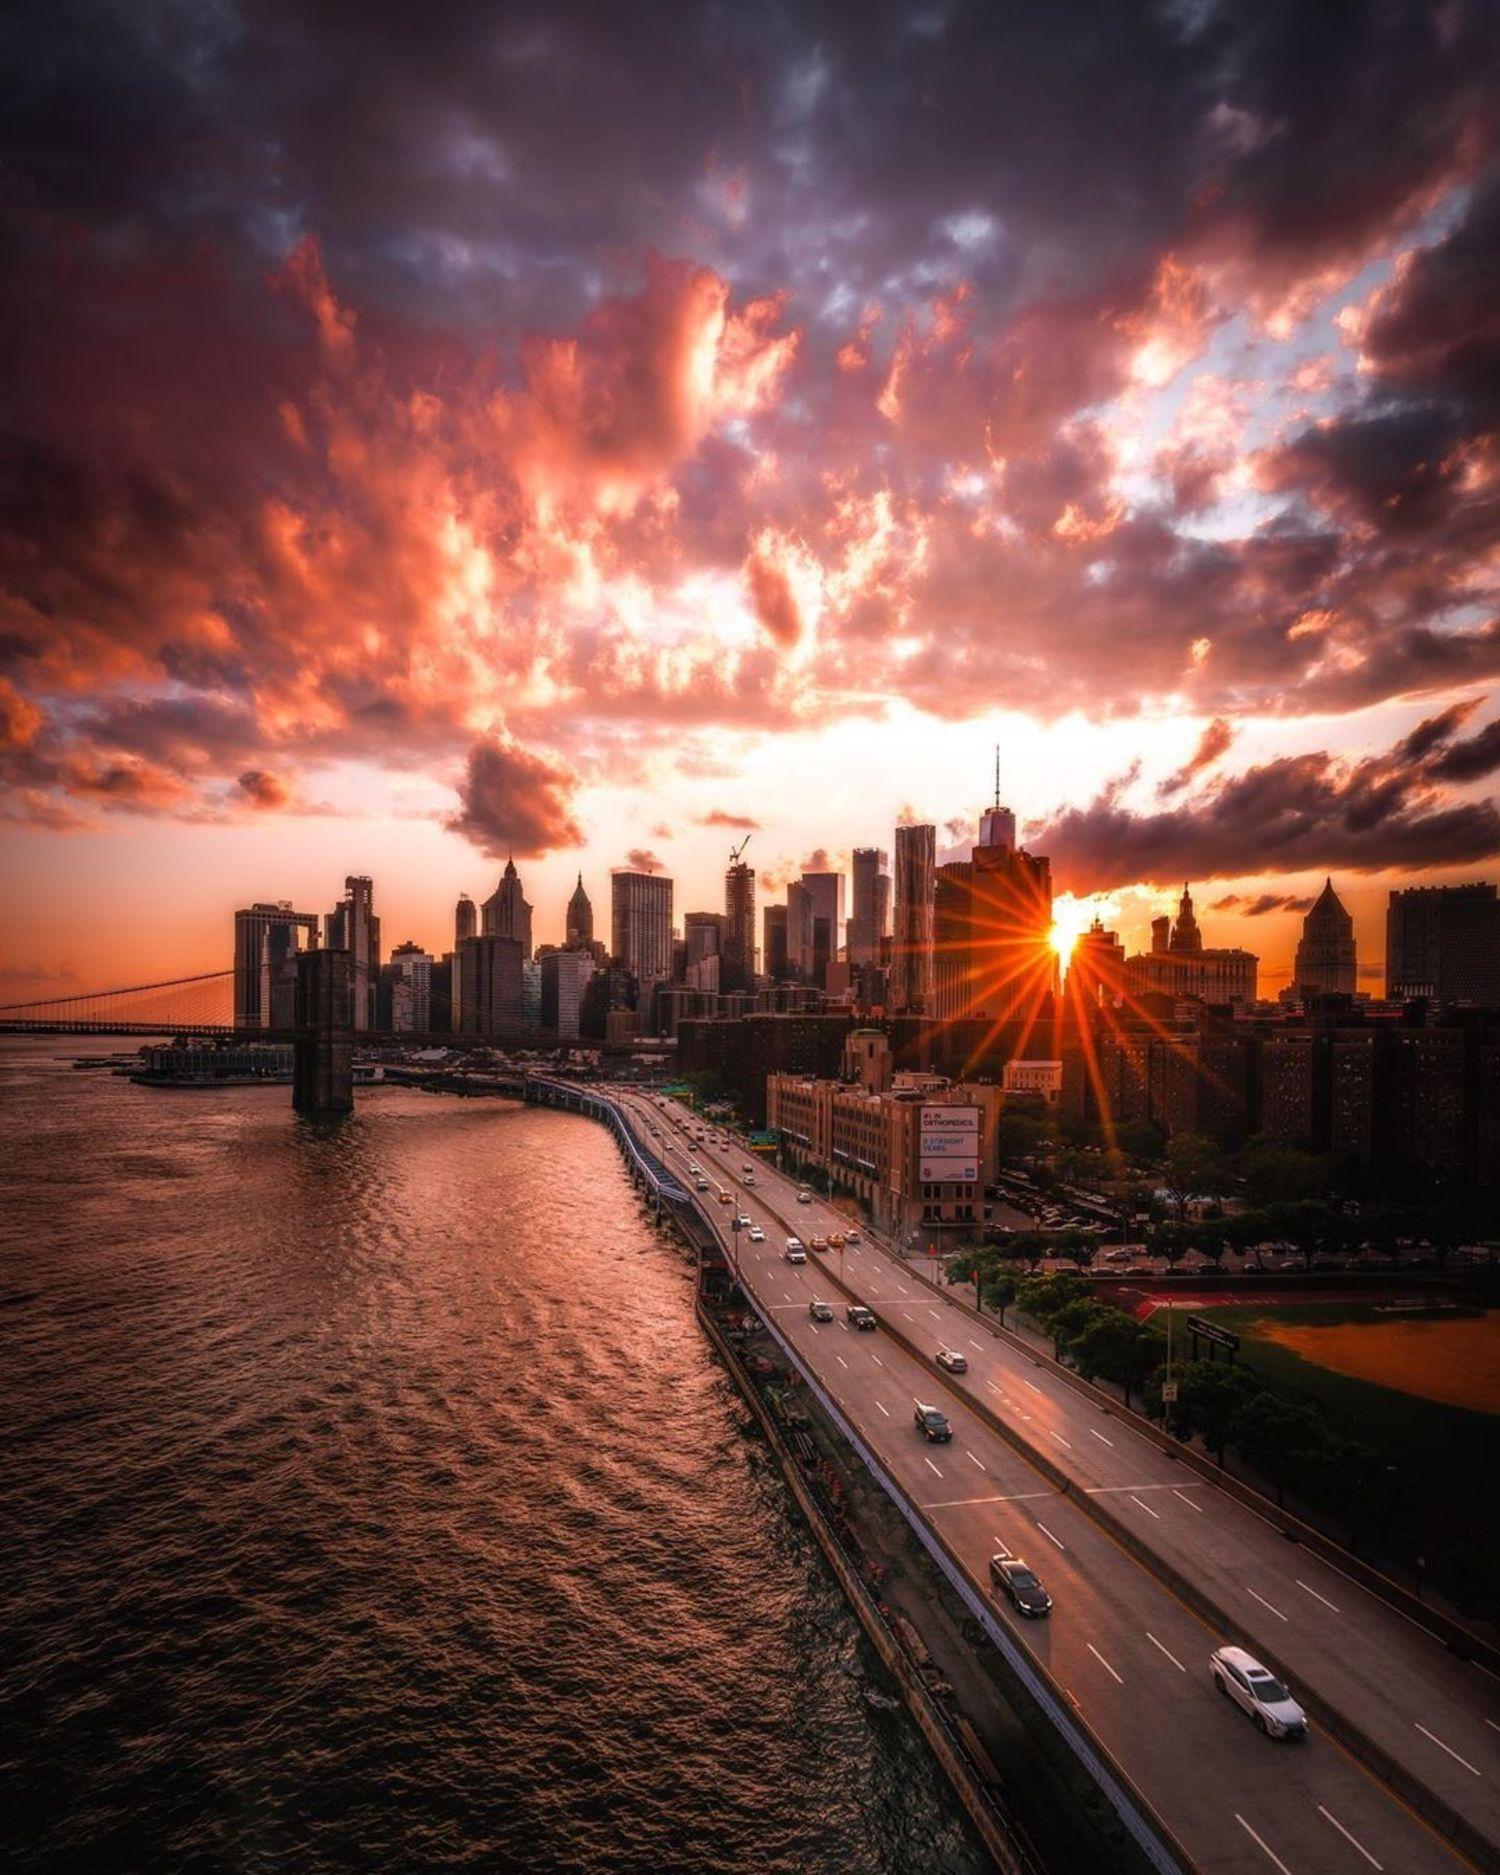 Sunset over Lower Manhattan skyline